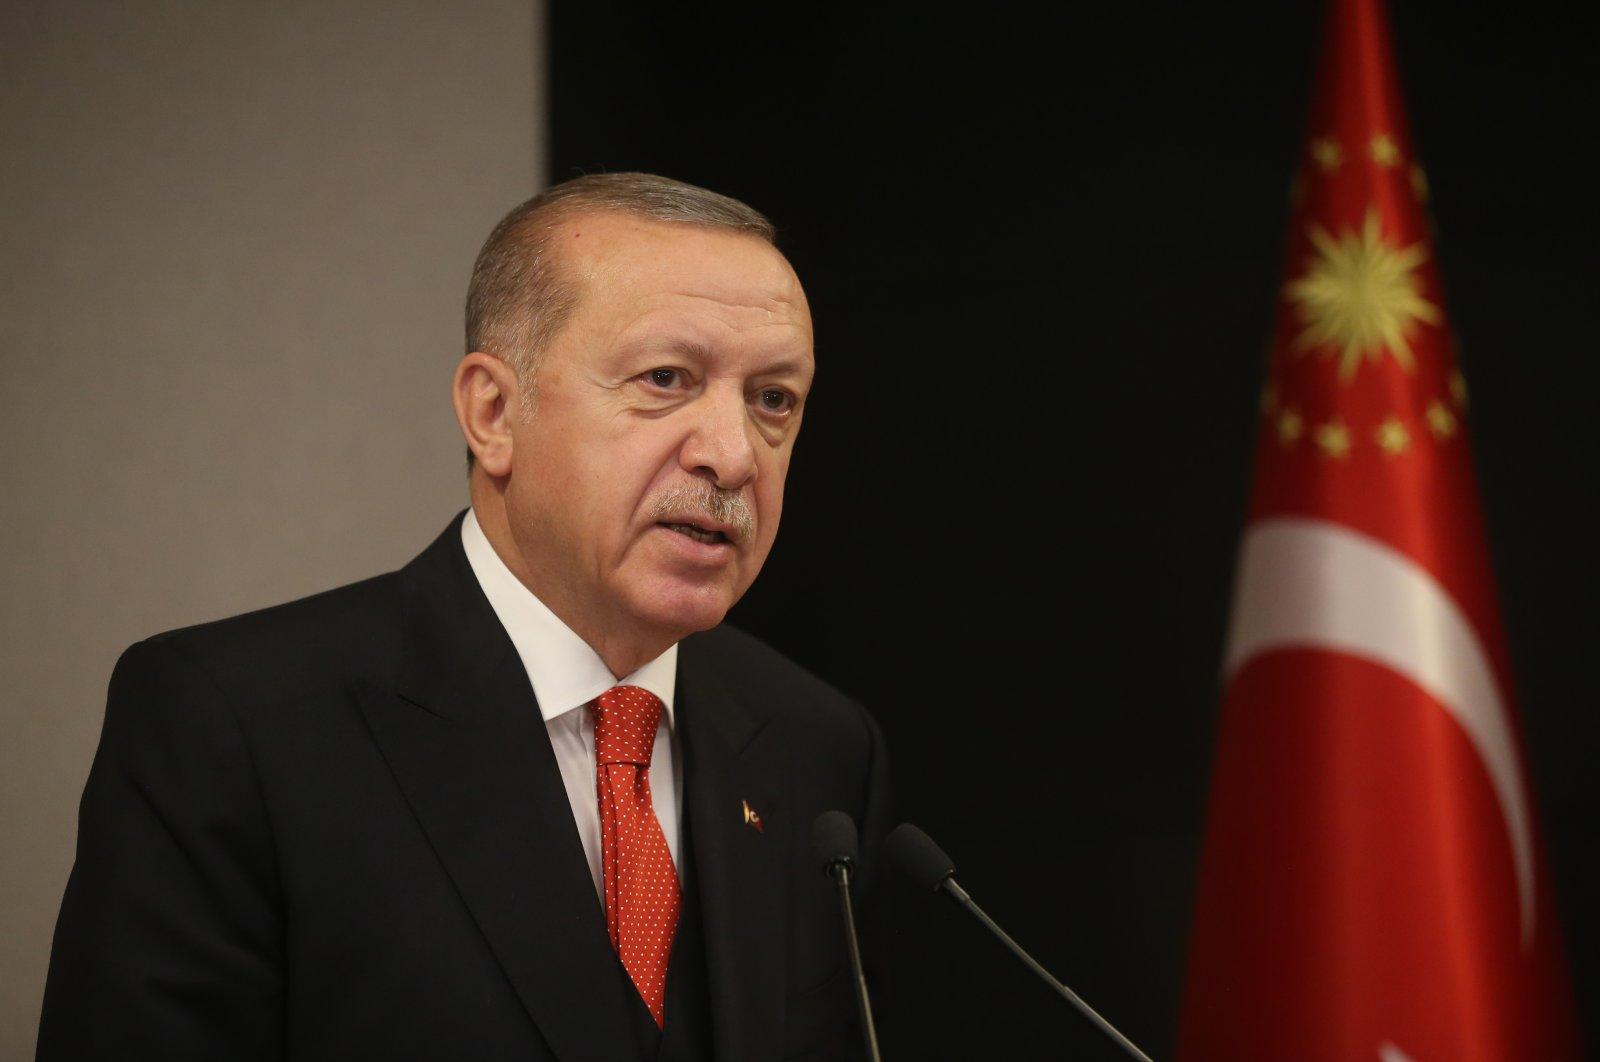 Erdogan njofton shtetrrethimin mbarëkombëtar para Bajramit